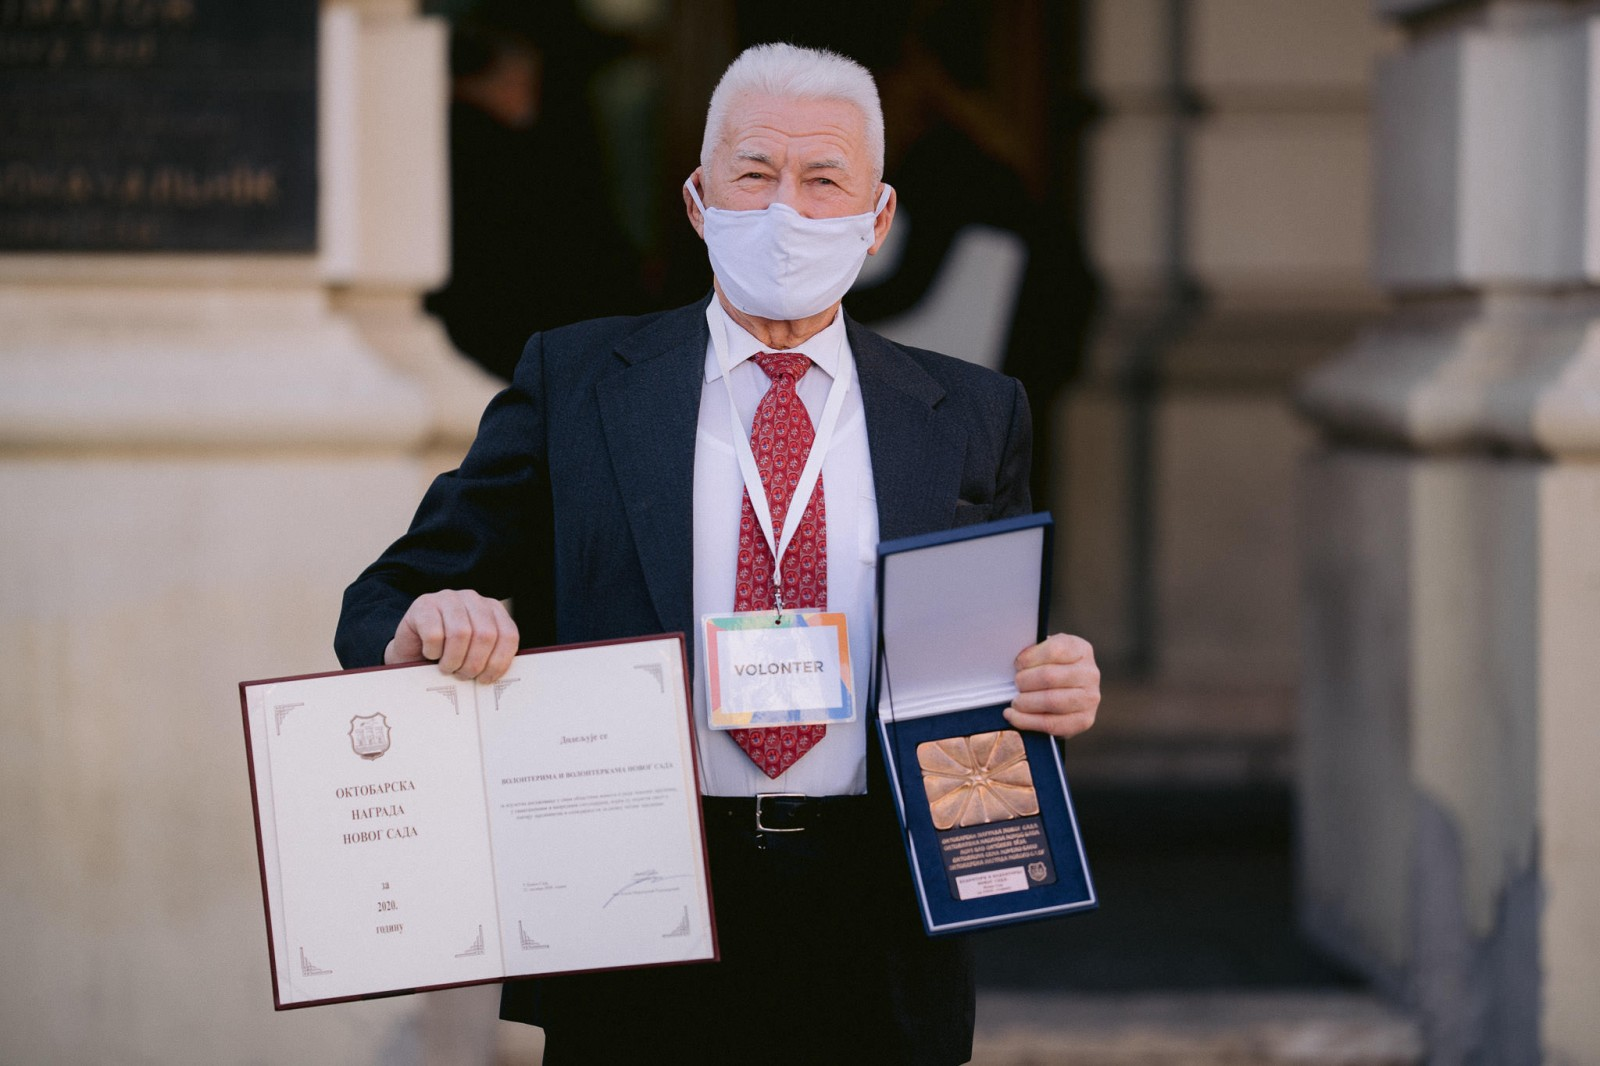 октобарска награда волонтери